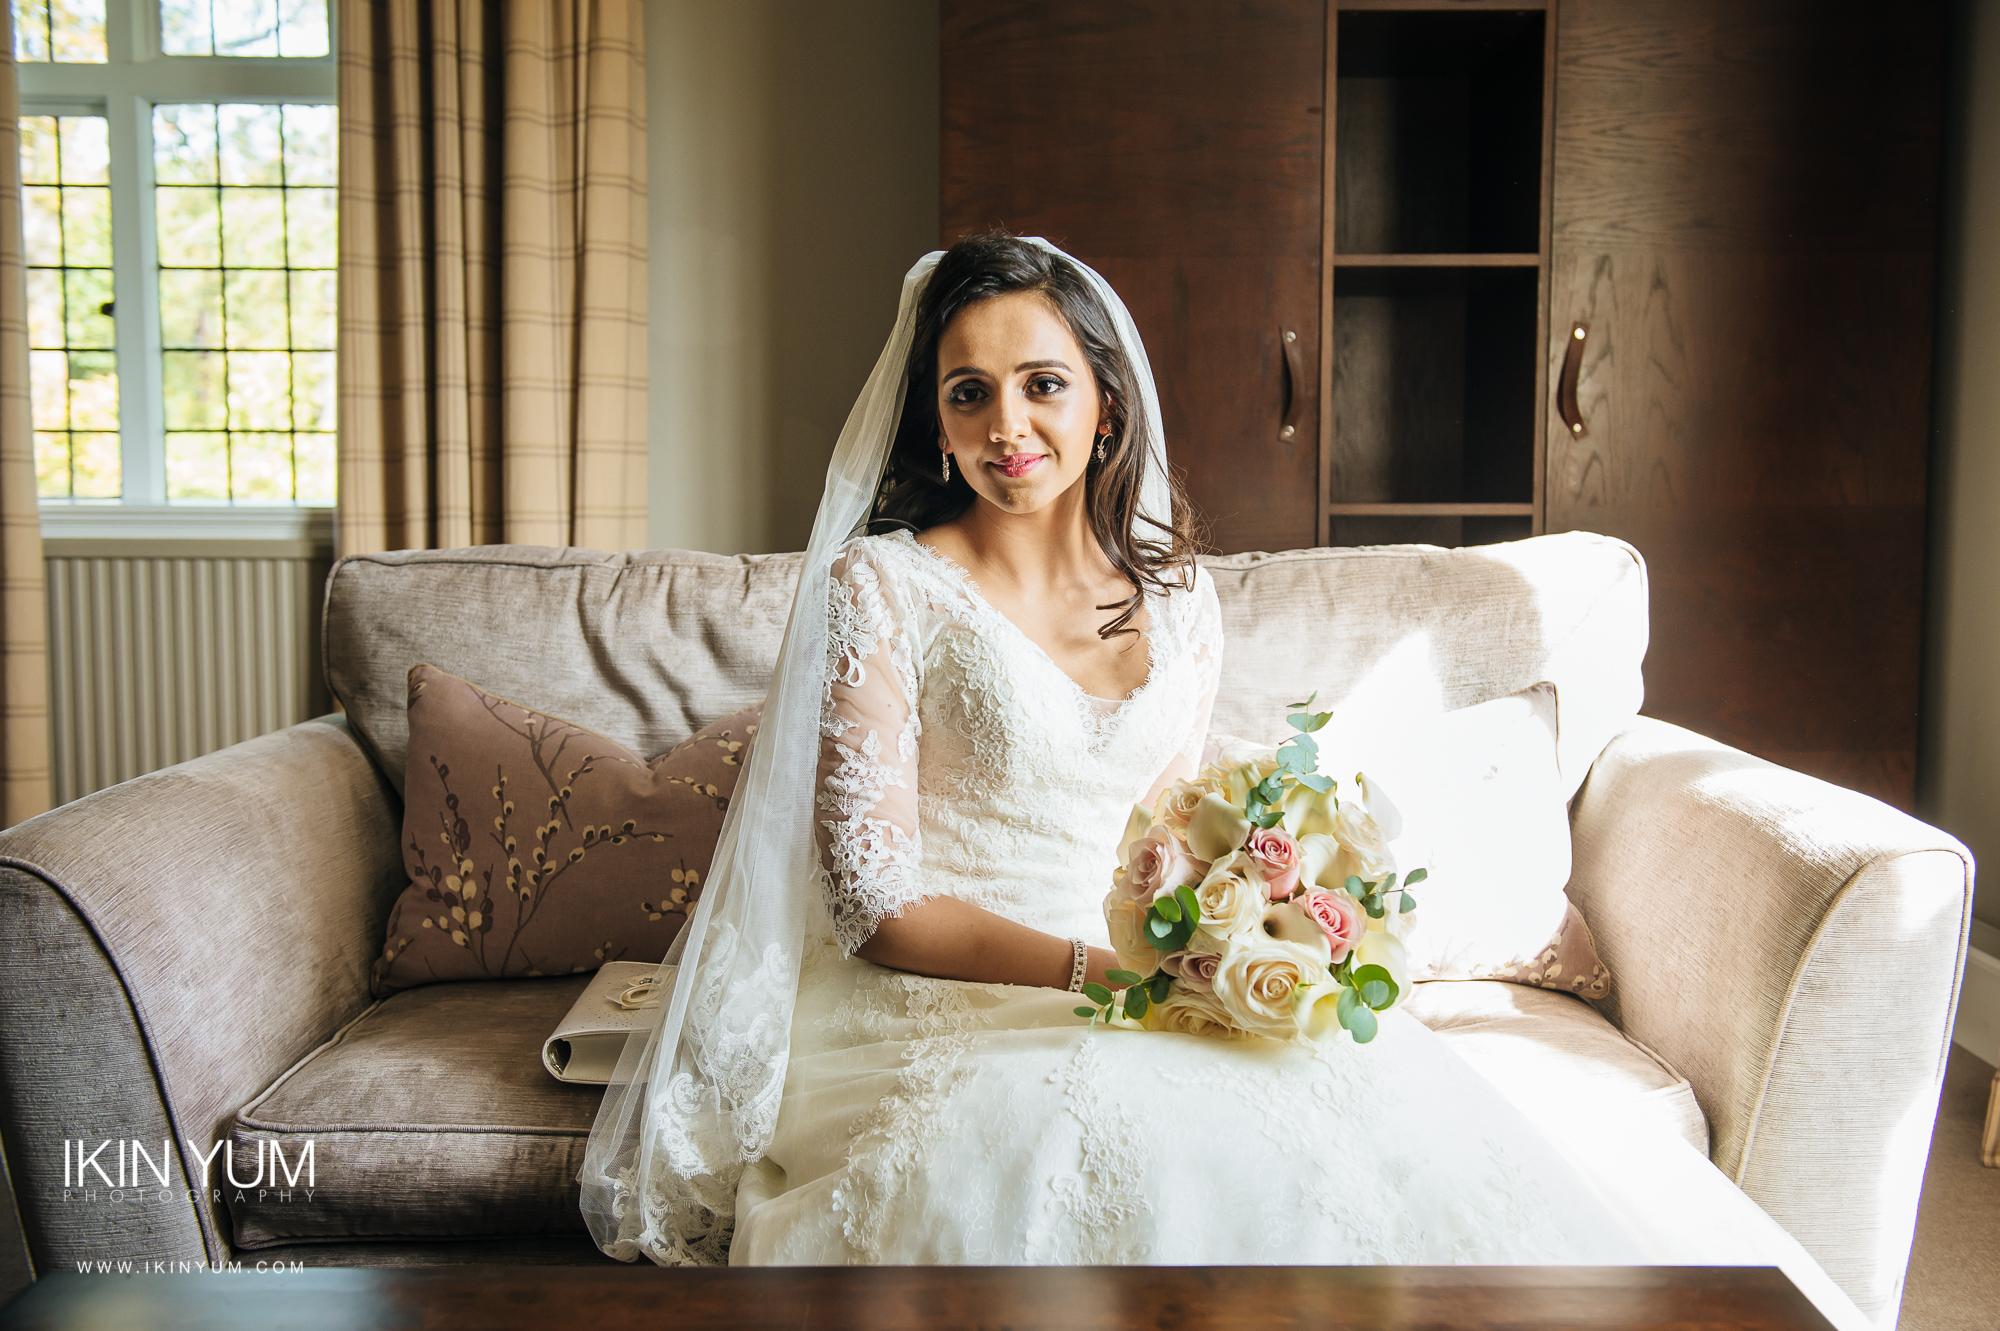 Laura Ashley Manor Wedding - Ikin Yum Photography-022.jpg